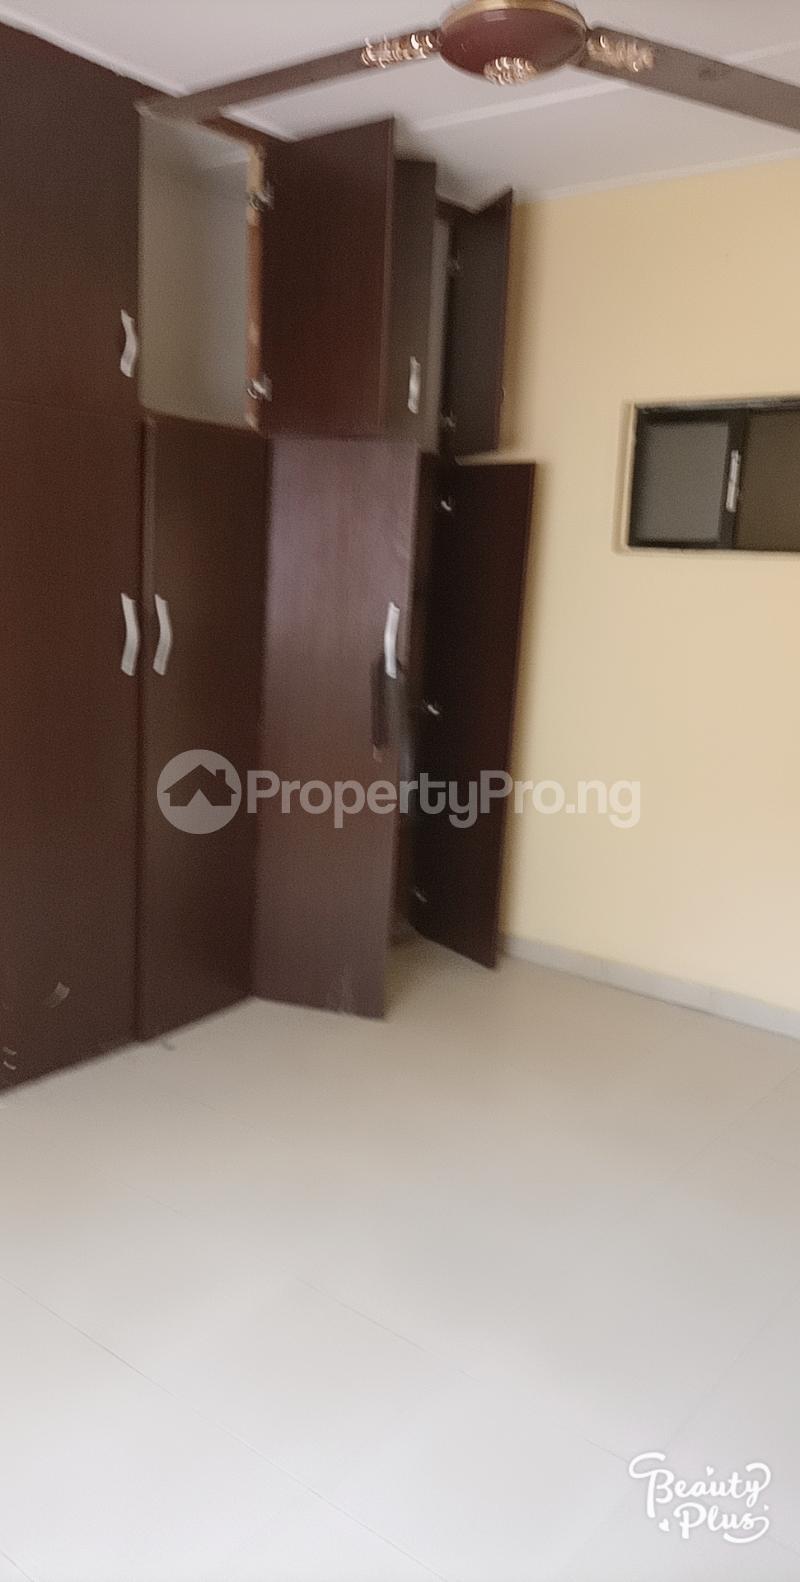 5 bedroom Semi Detached Duplex House for sale Ajao estate Isolo. Lagos Ajao Estate Isolo Lagos - 6